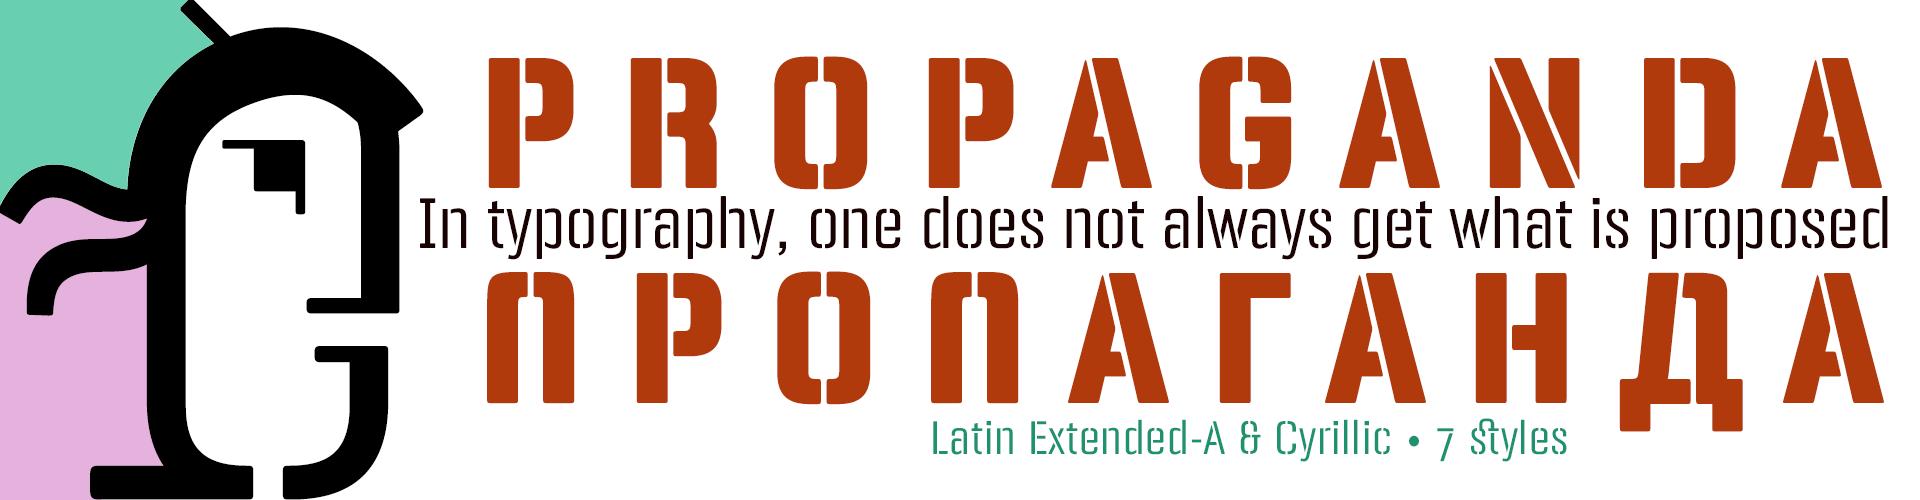 Panfleta Stencil Typefaces- Latin Extended-A & Cyrillic